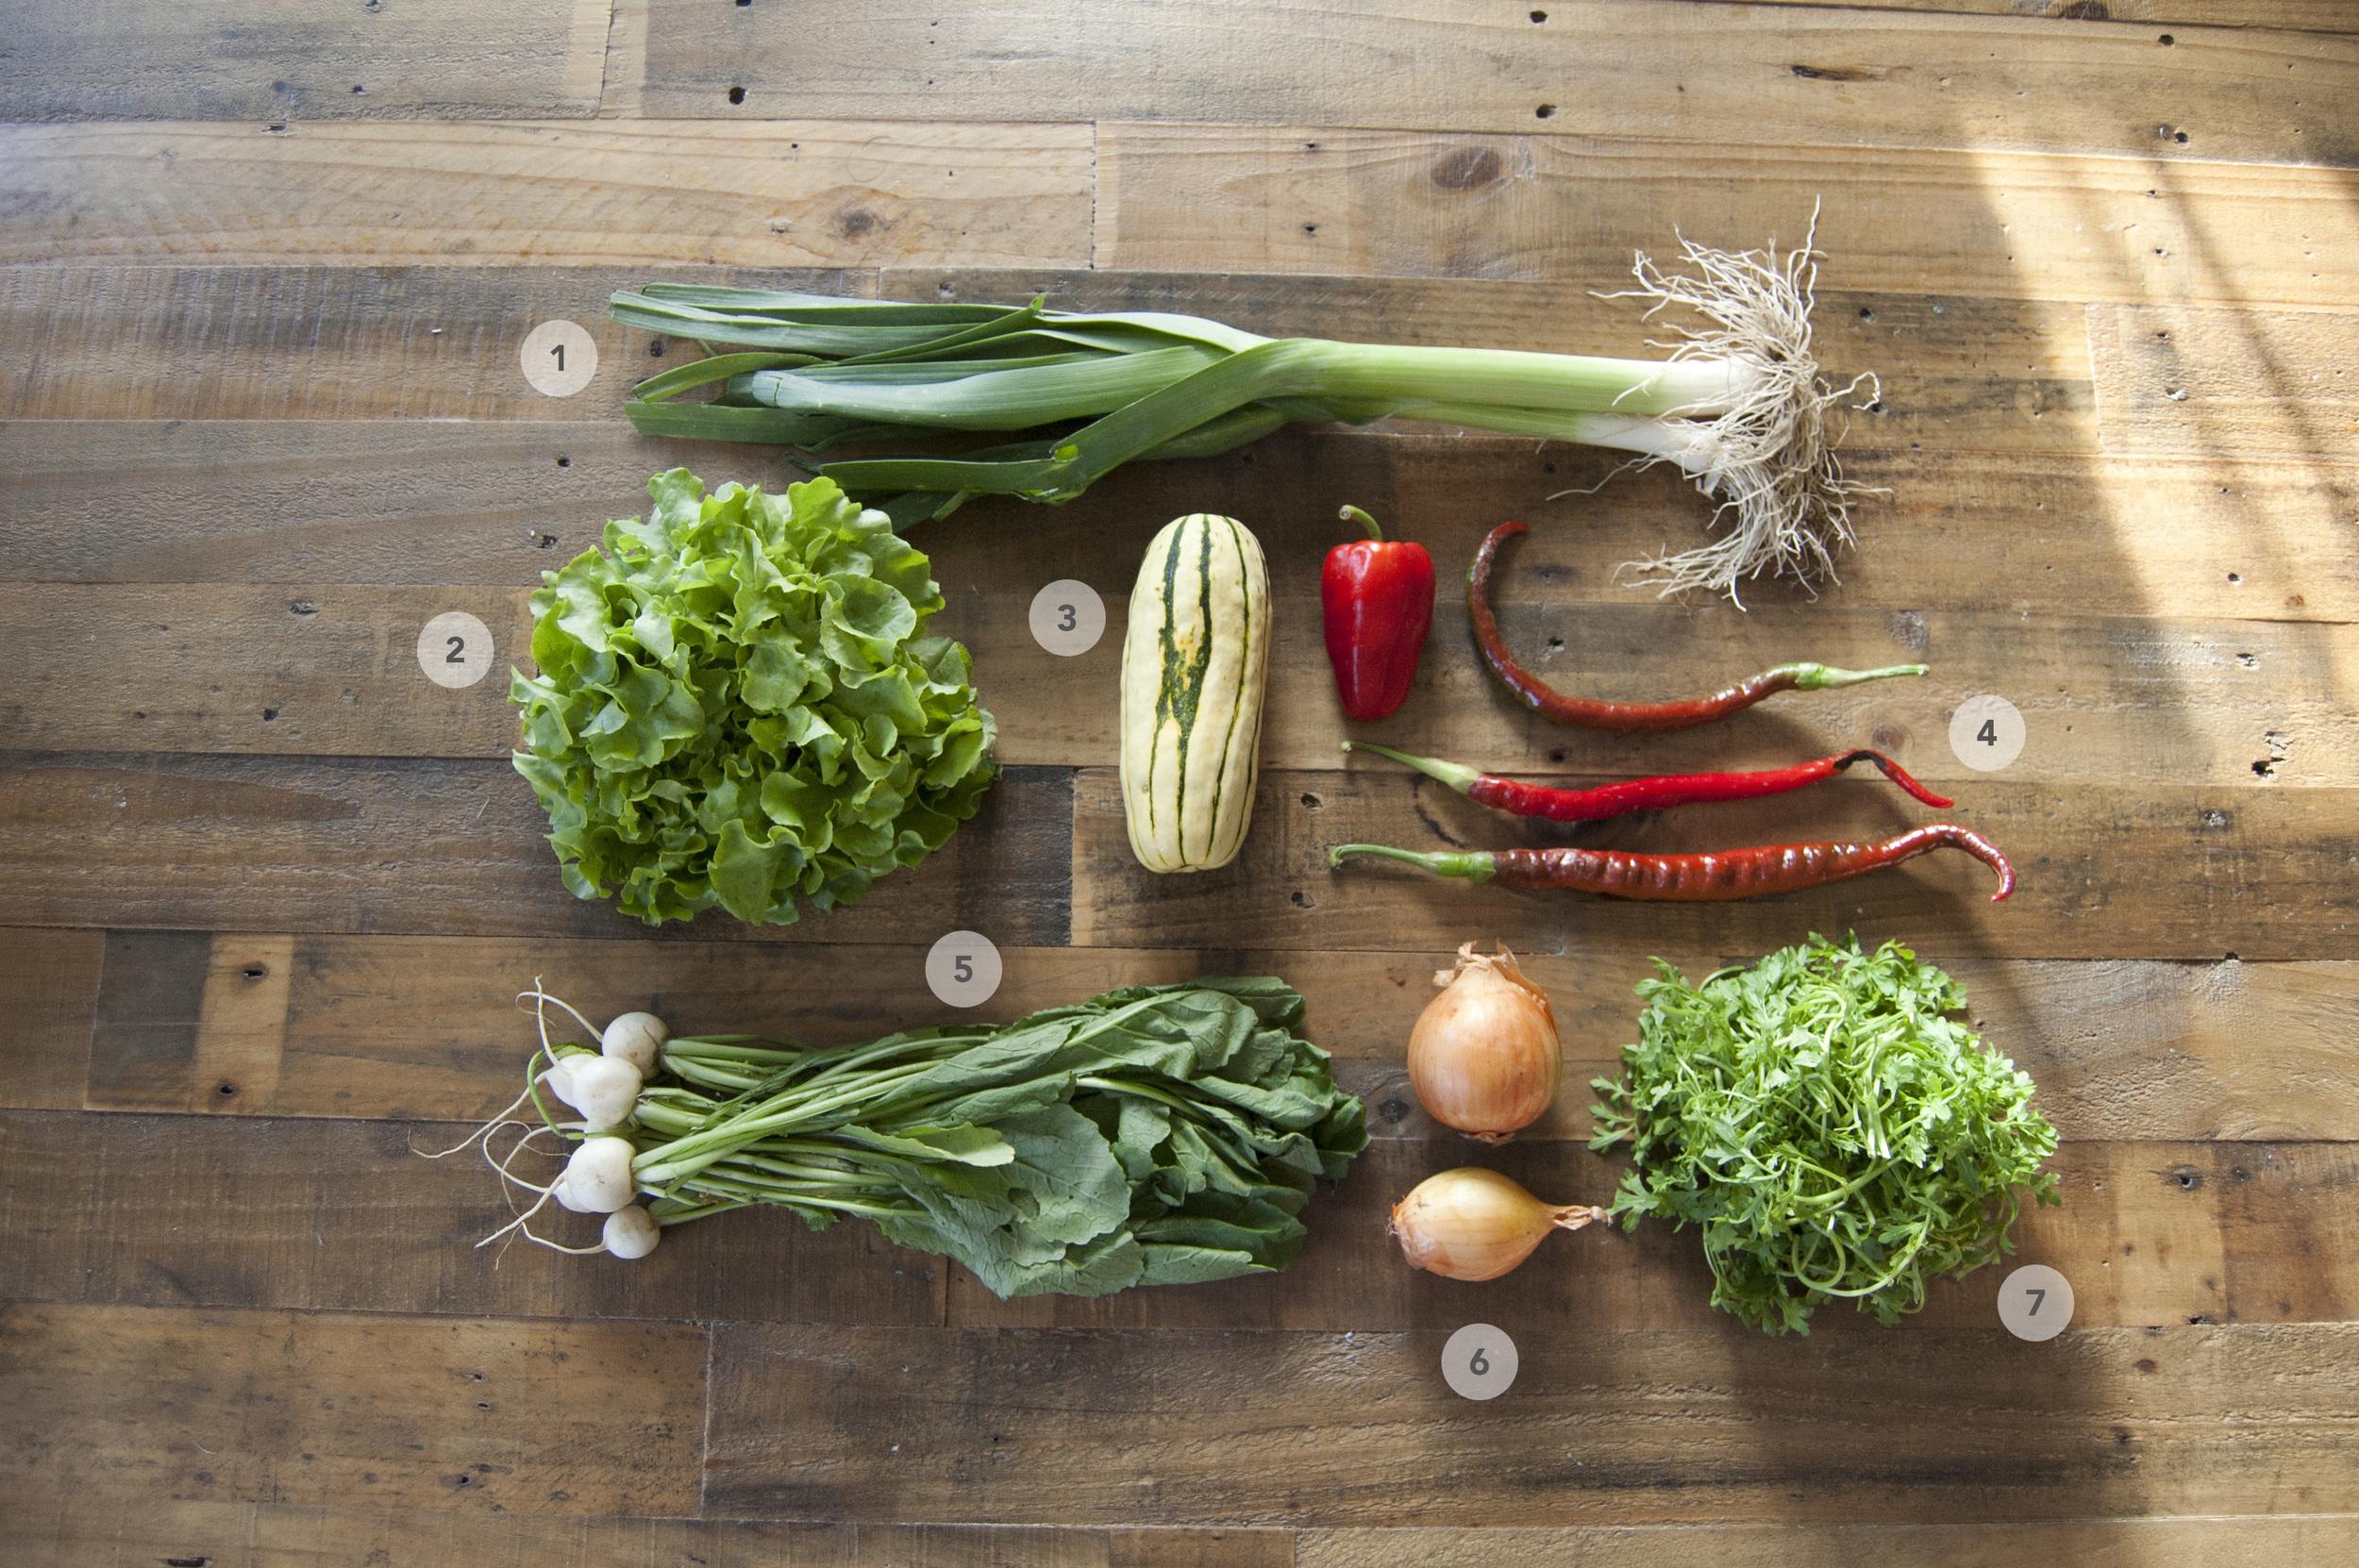 1.  Leeks |2. Panisse Lettuce  | 3. Delicata Squash  | 4. Mixed Hot Peppers | 5.  Hakurei Turnips | 6.  Yellow Onions | 7. Cressida Cress